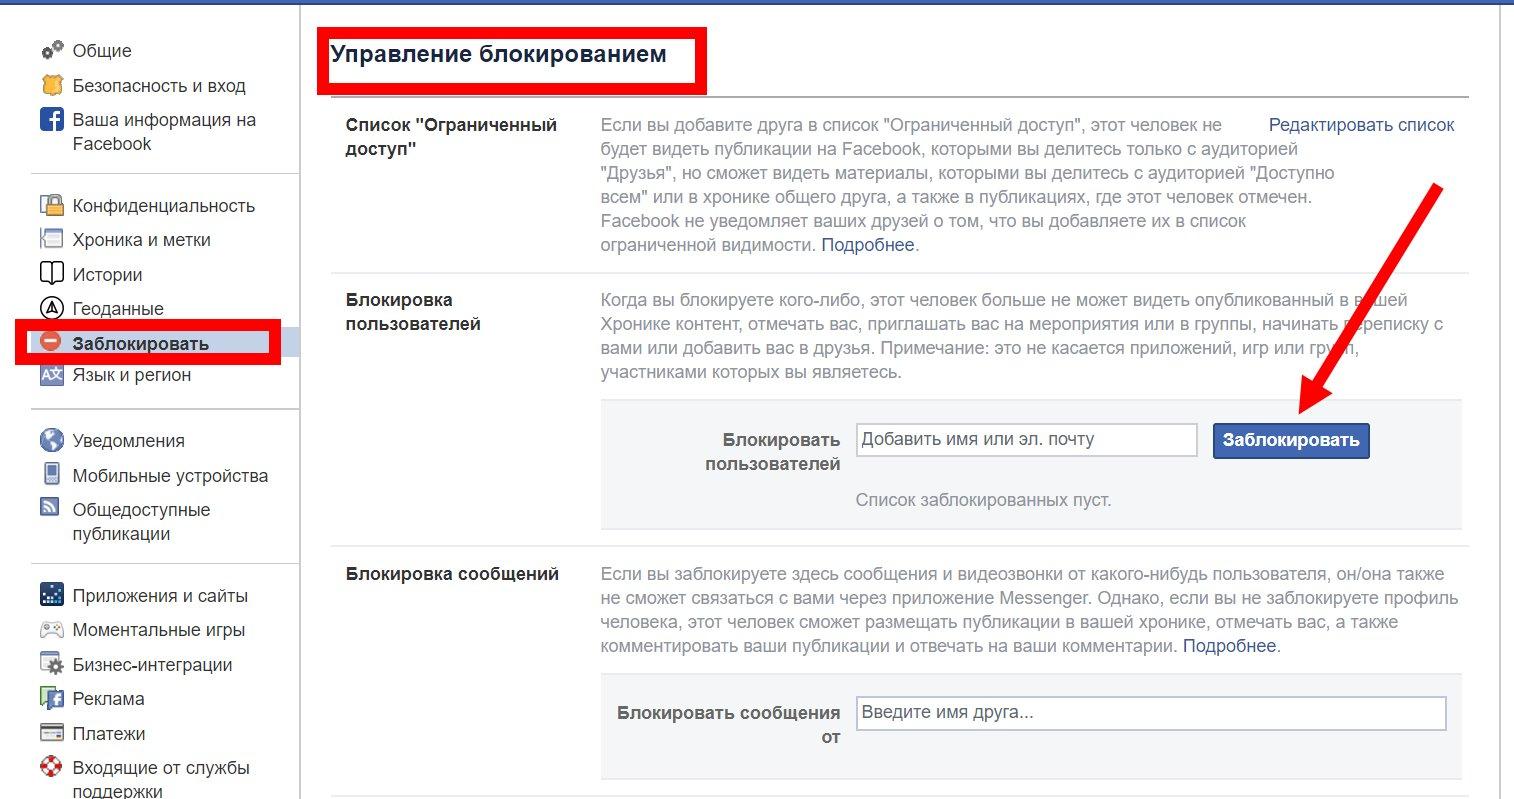 FB_kak-ydalit-dryzei8.jpg